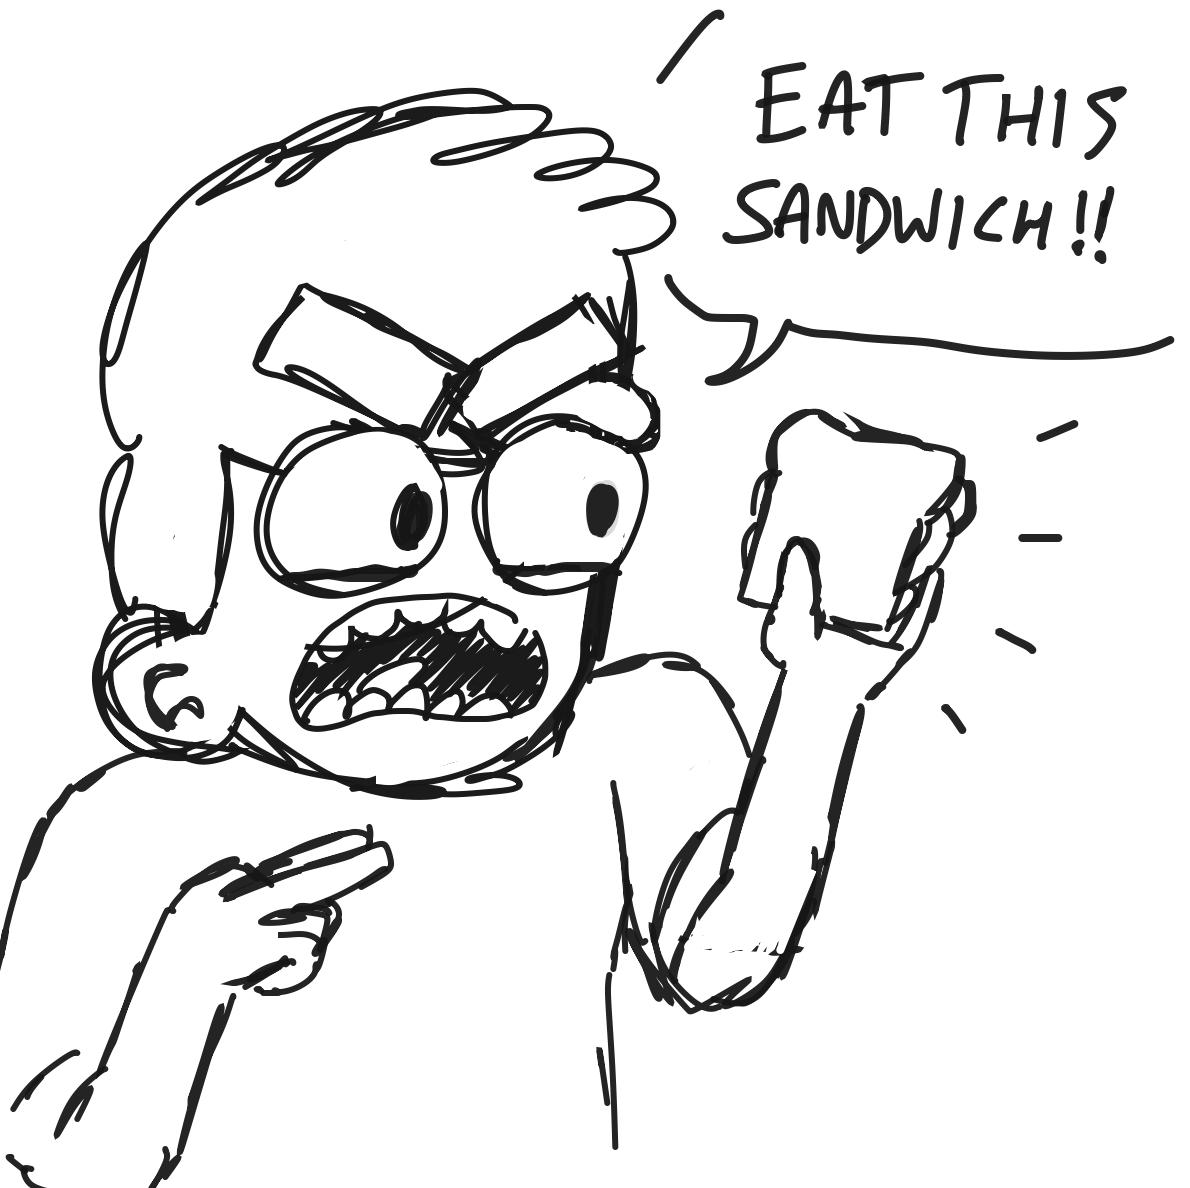 Drawing in Eat this sandwich by bebblett